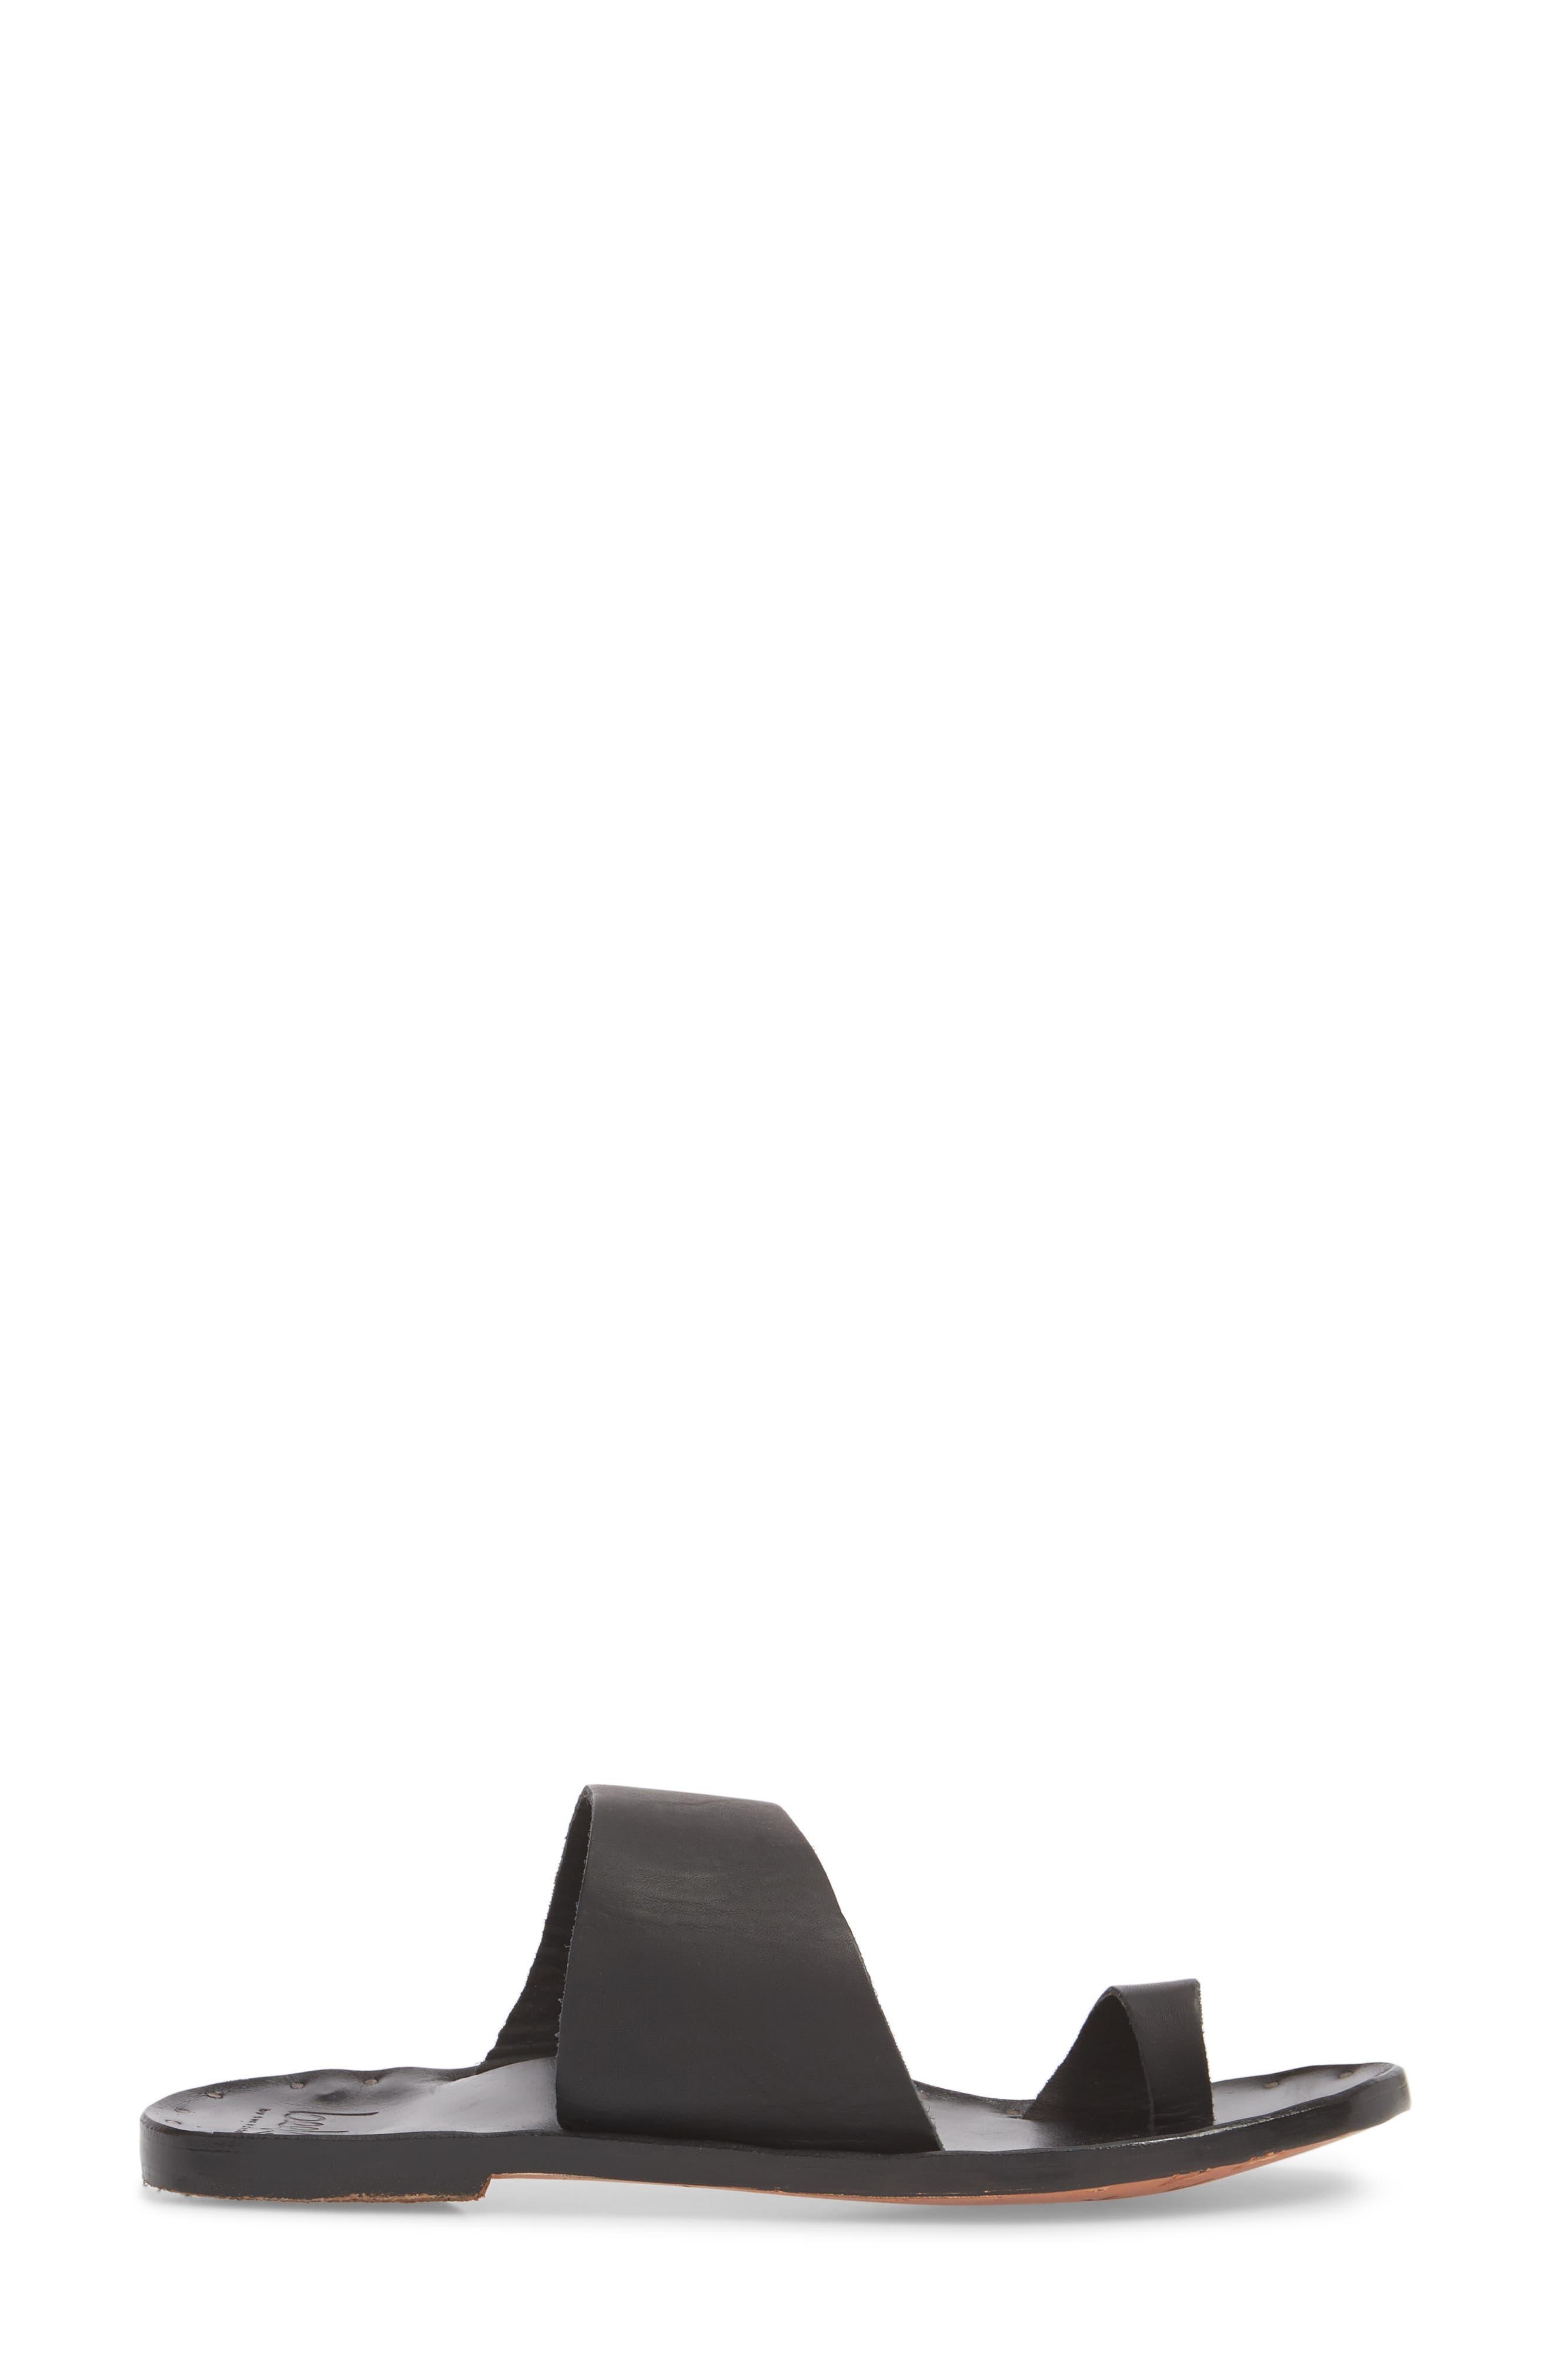 Finch Sandal,                             Alternate thumbnail 3, color,                             BLACK/ BLACK